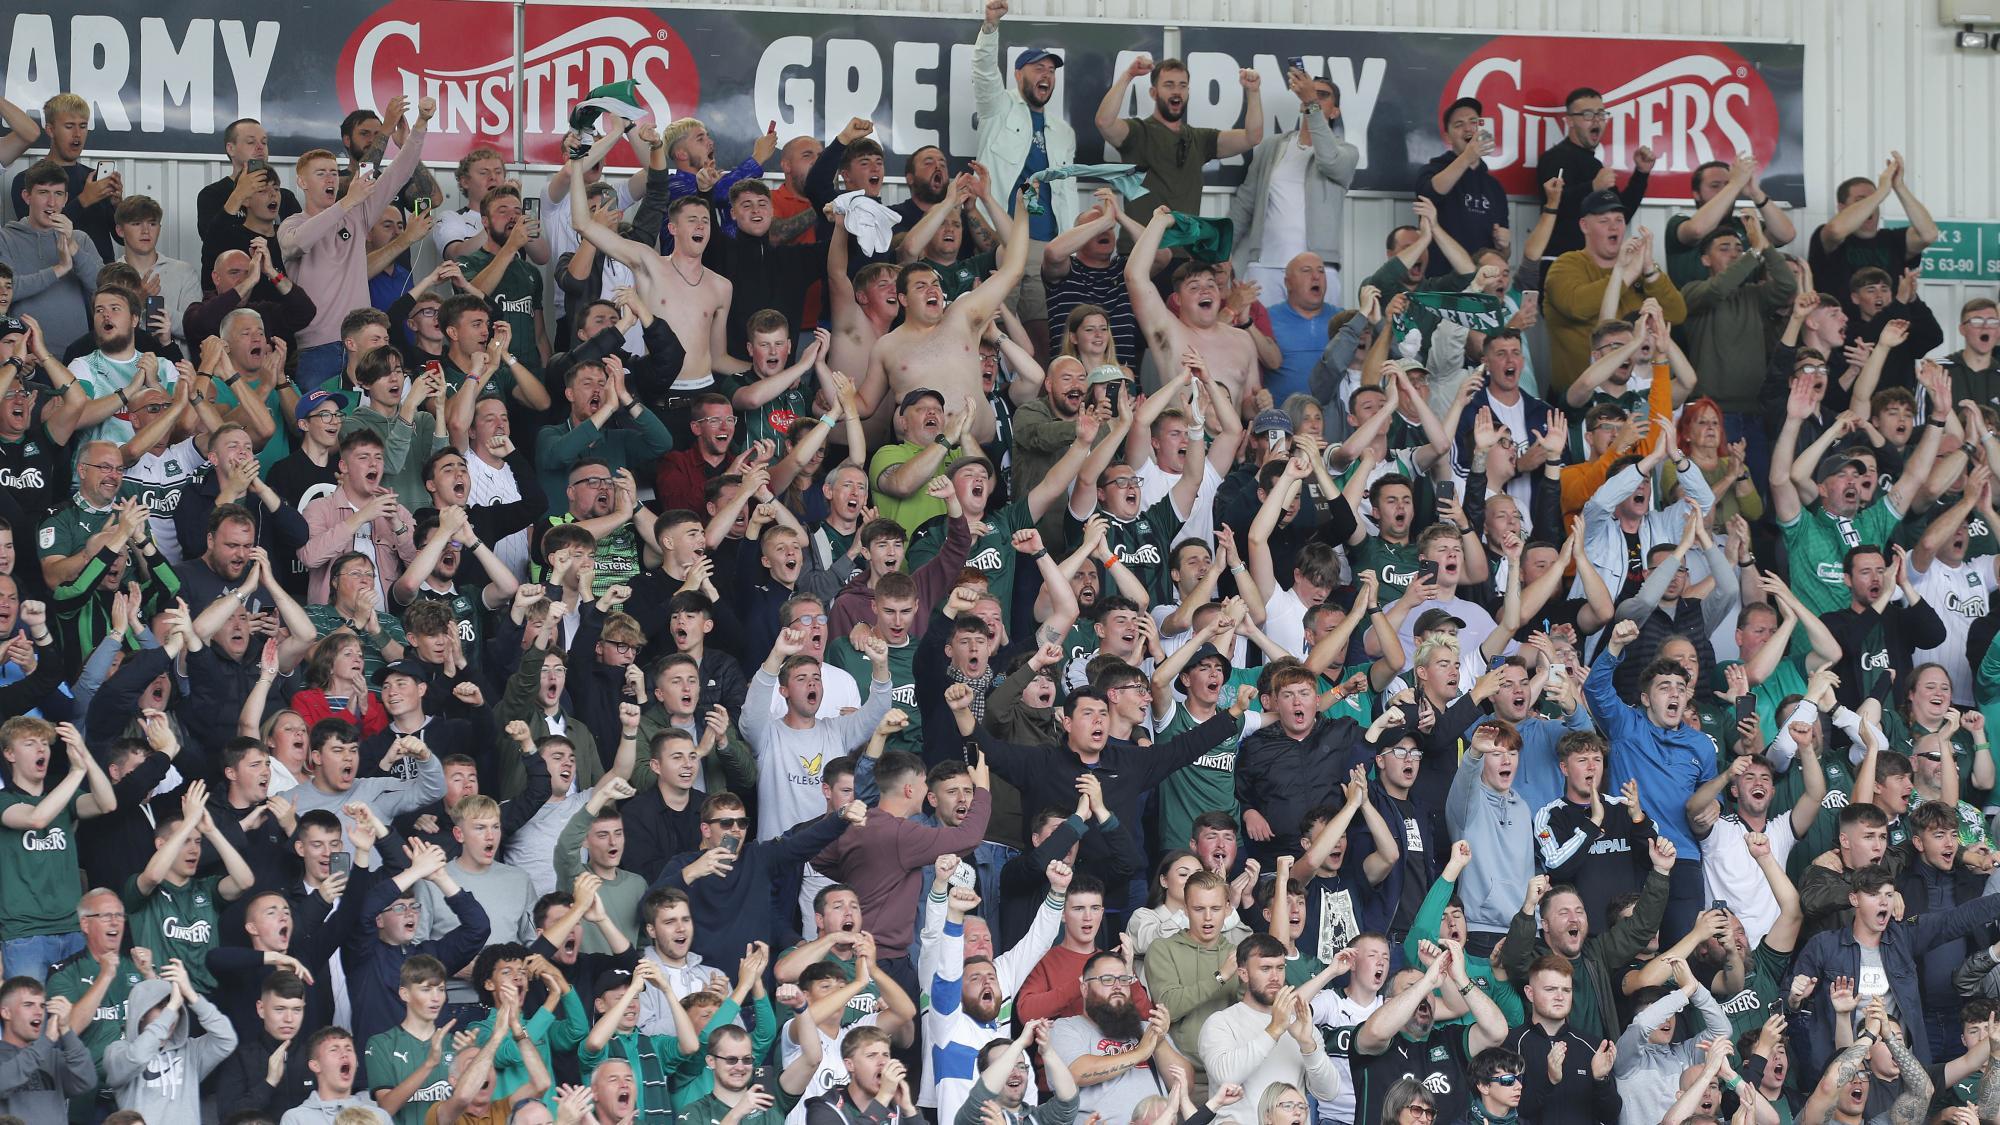 Fans celebrate a goal